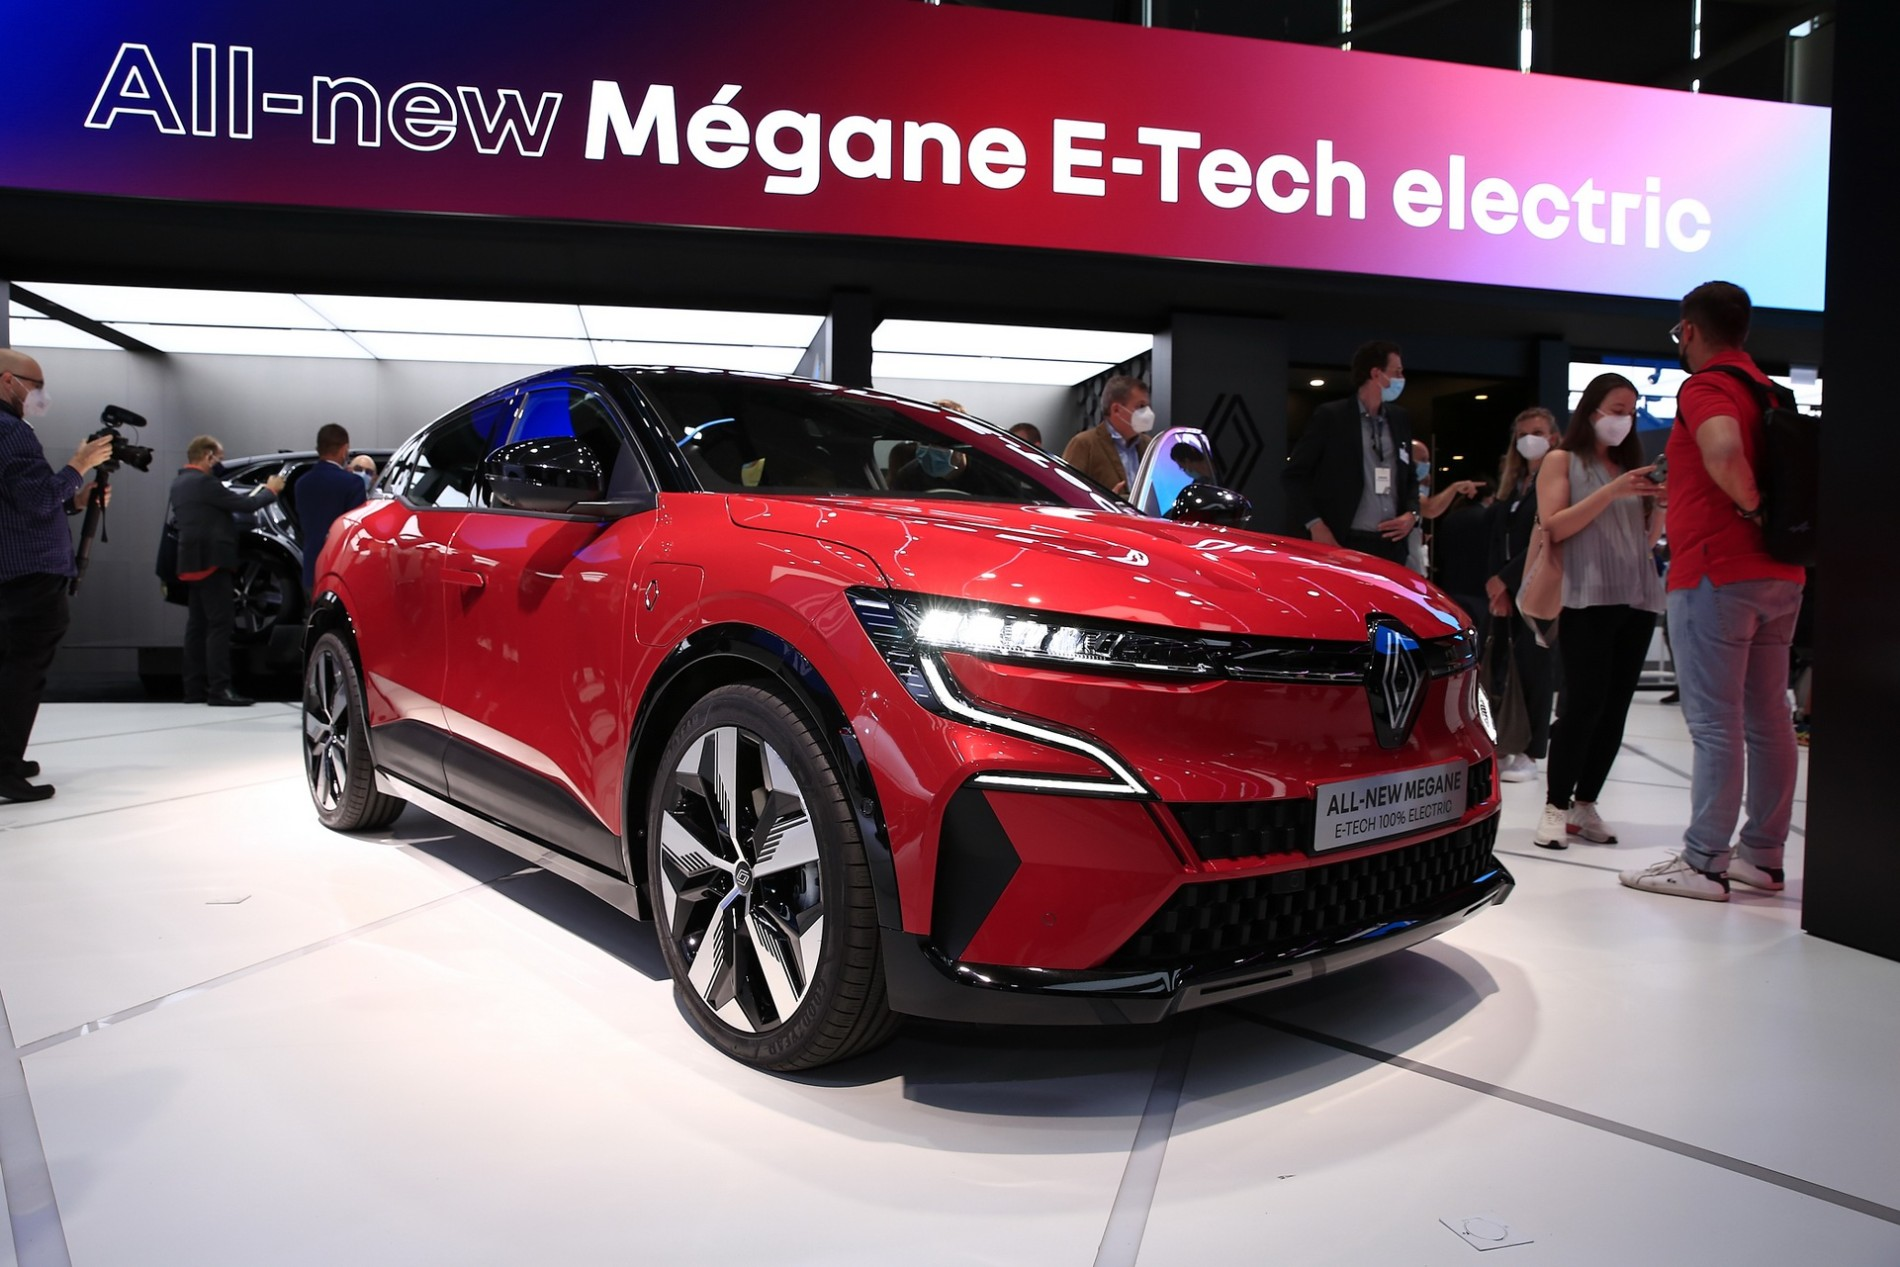 Renault Megane E-Tech - Poze reale - Renault Megane E-Tech - Poze reale